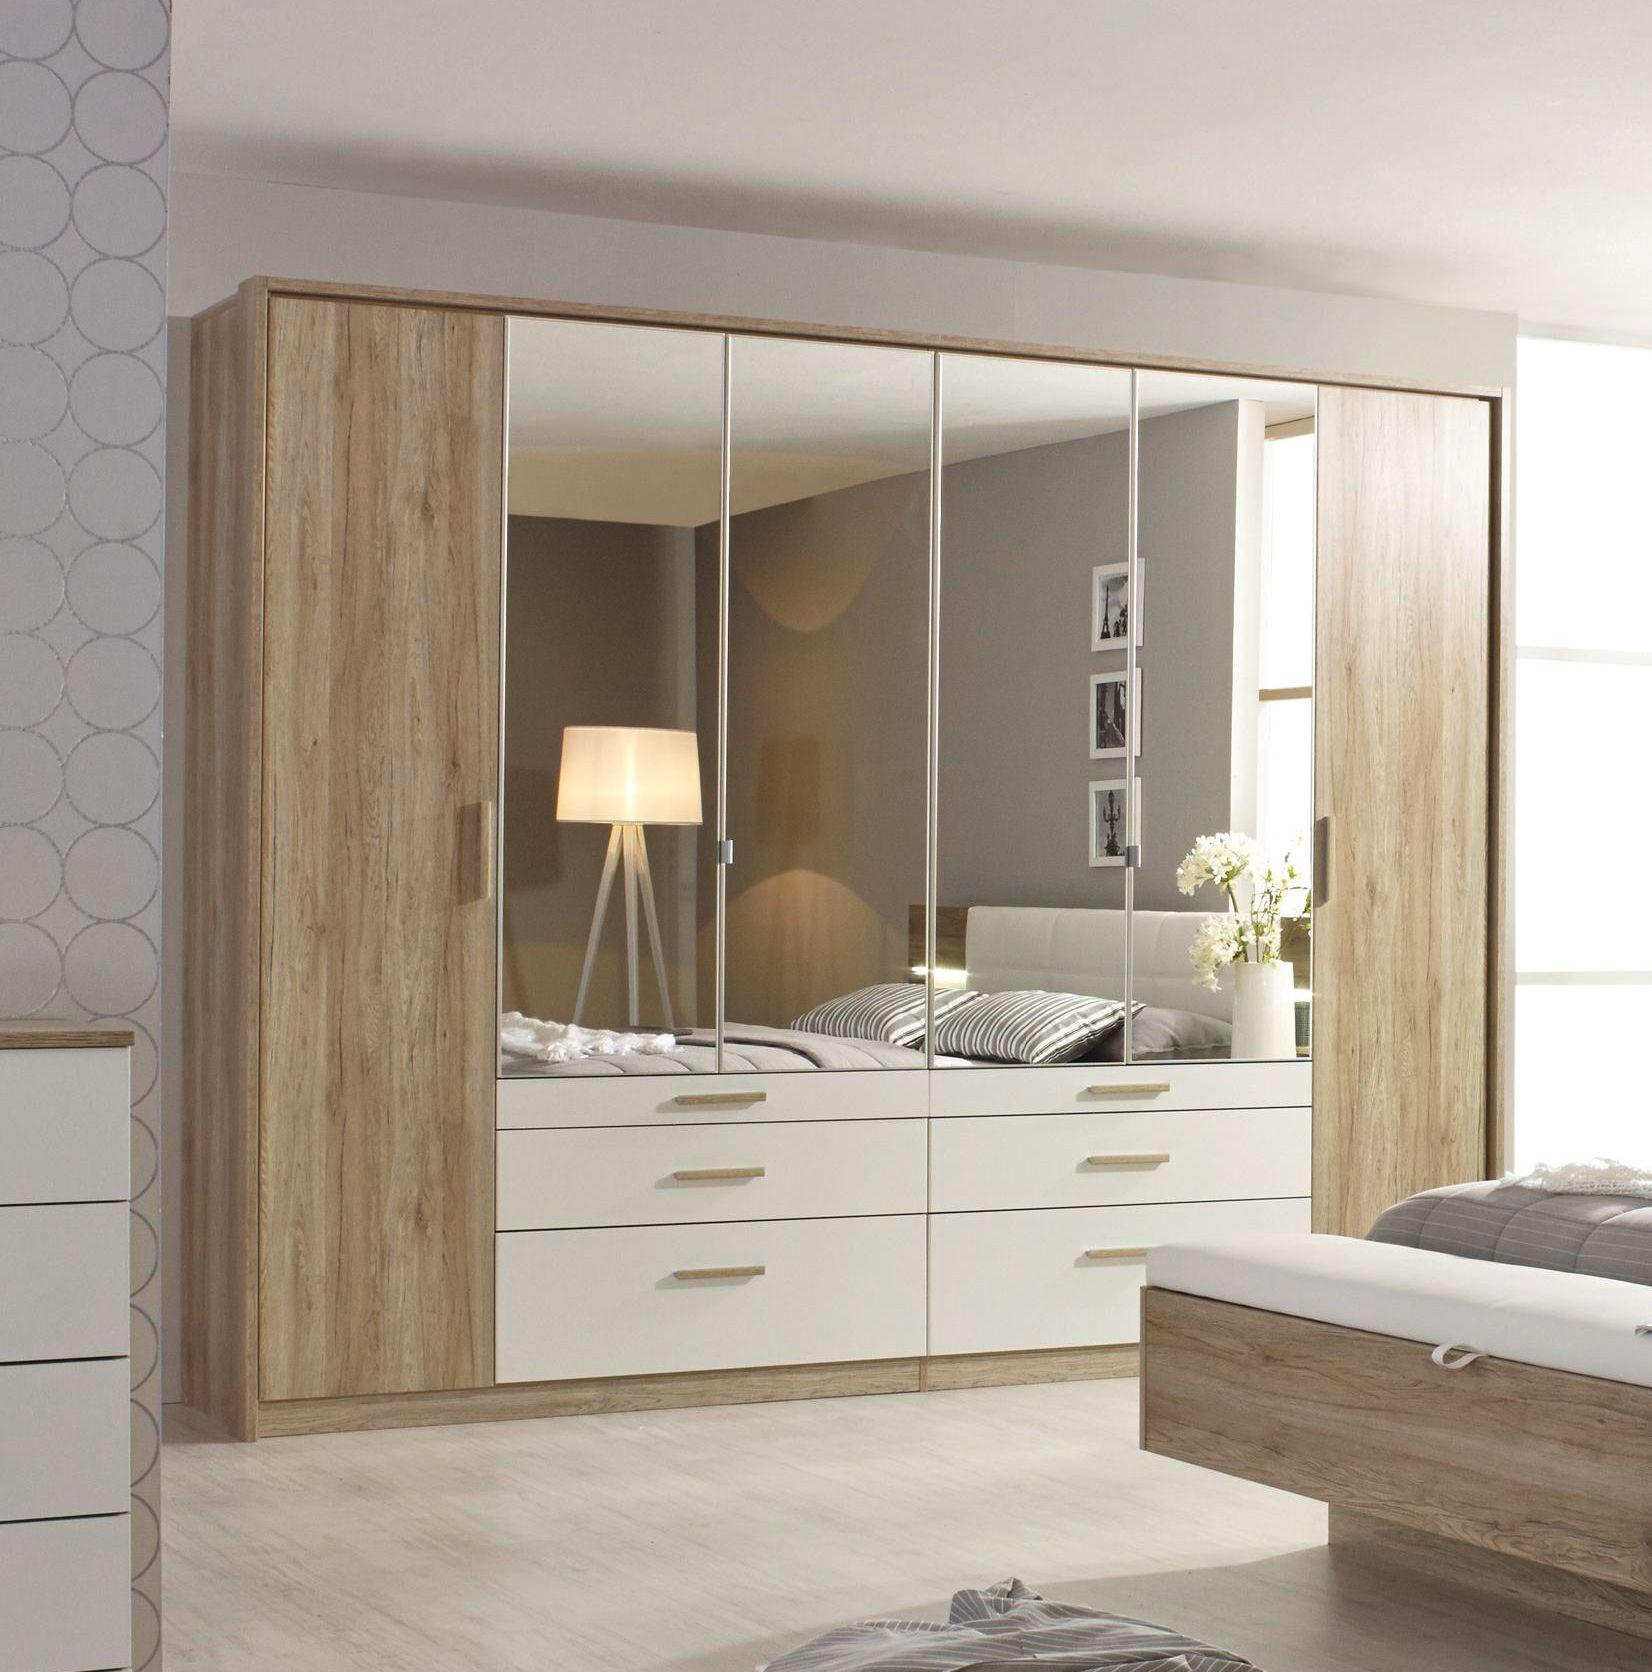 13+ Model placard chambre coucher ideas